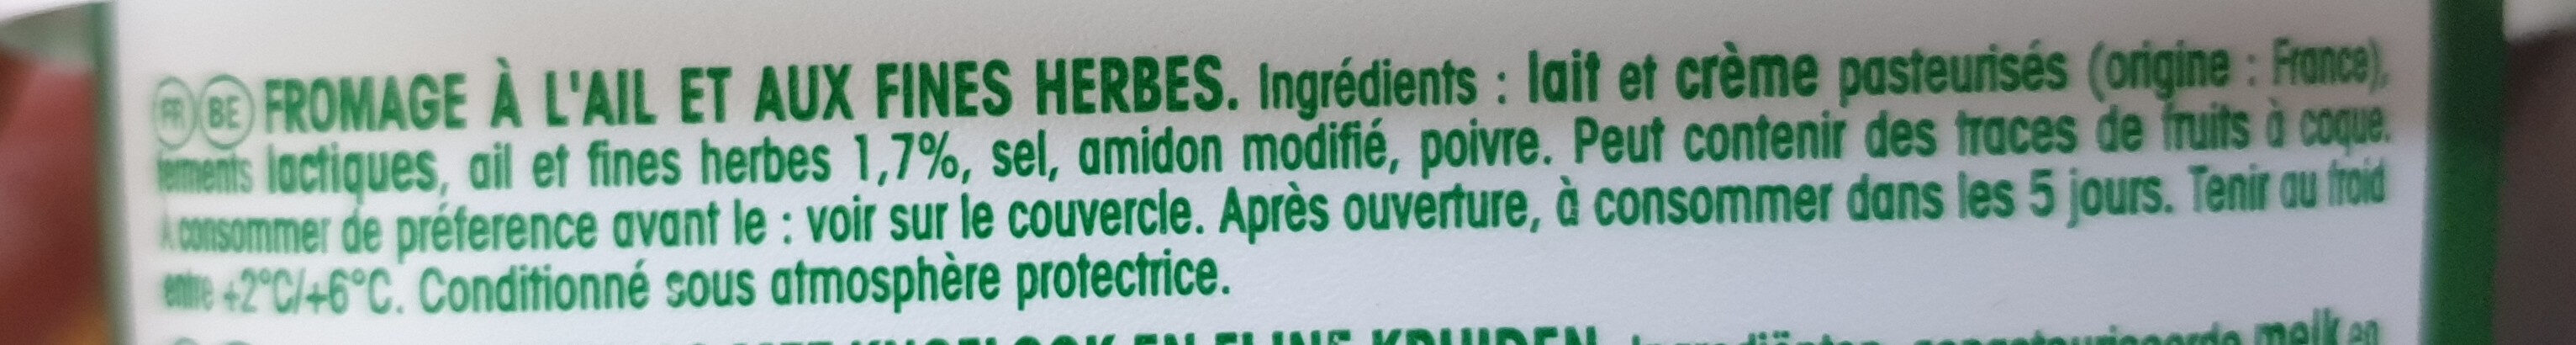 Boursin salade & apéritif ail & fines herbes - Ingrediënten - fr